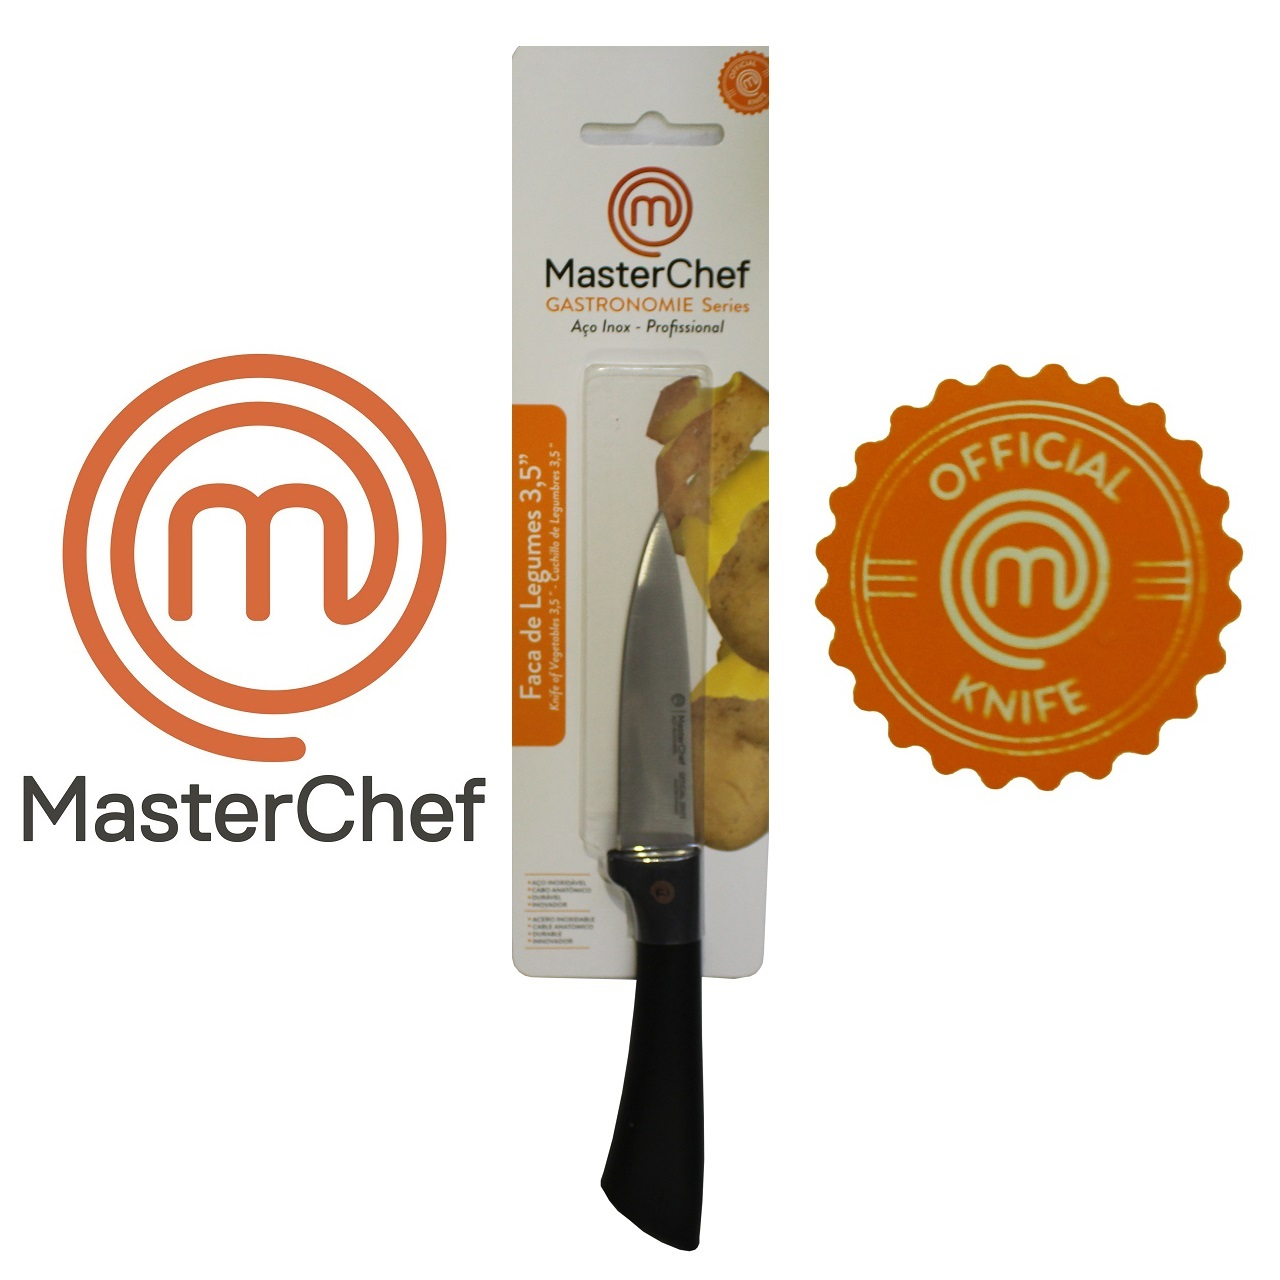 Faca 3,5 Legumes Official Knife Gastronomie MasterChef